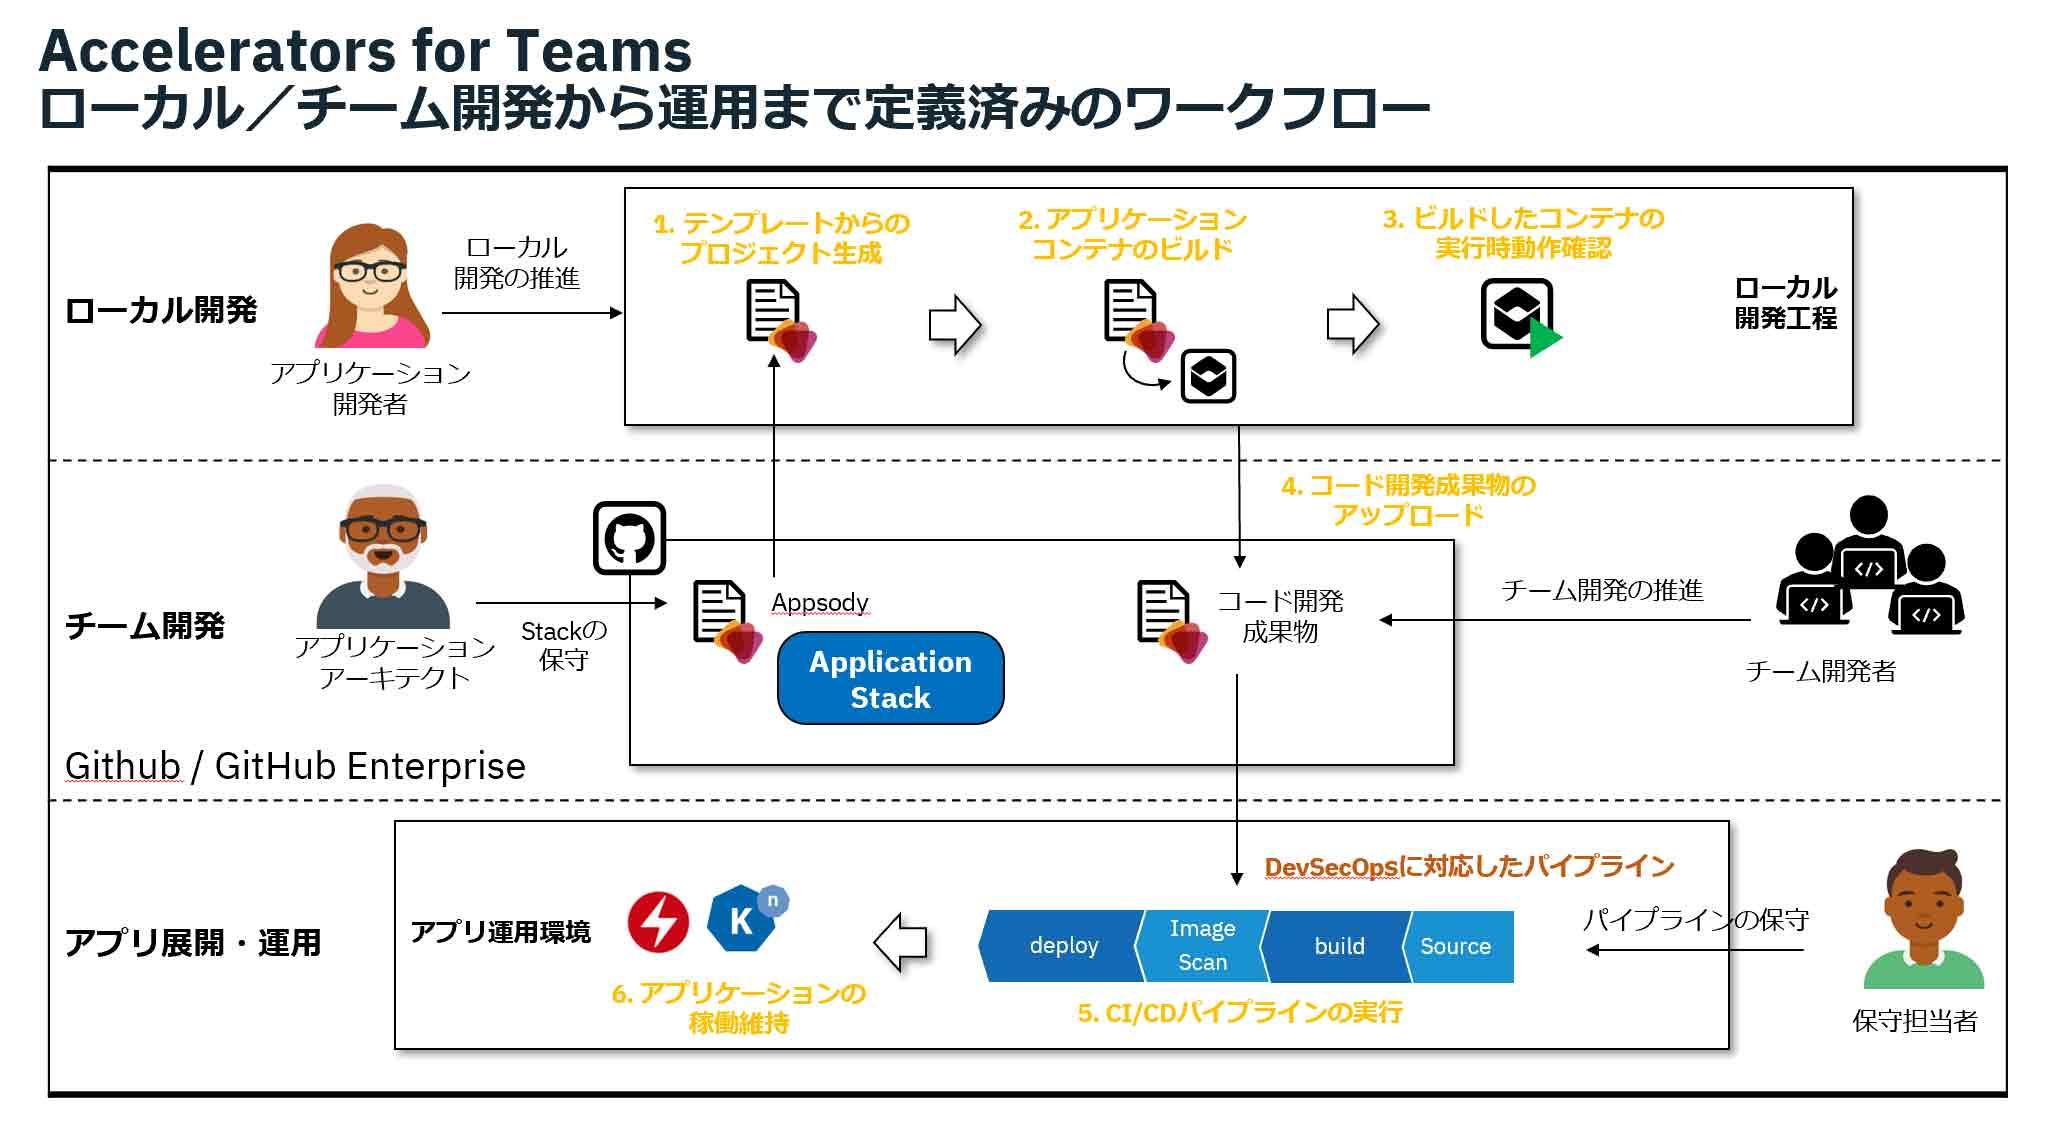 Accelerators for Teams ローカル/チーム開発から運用まで定義済みのワークフロー